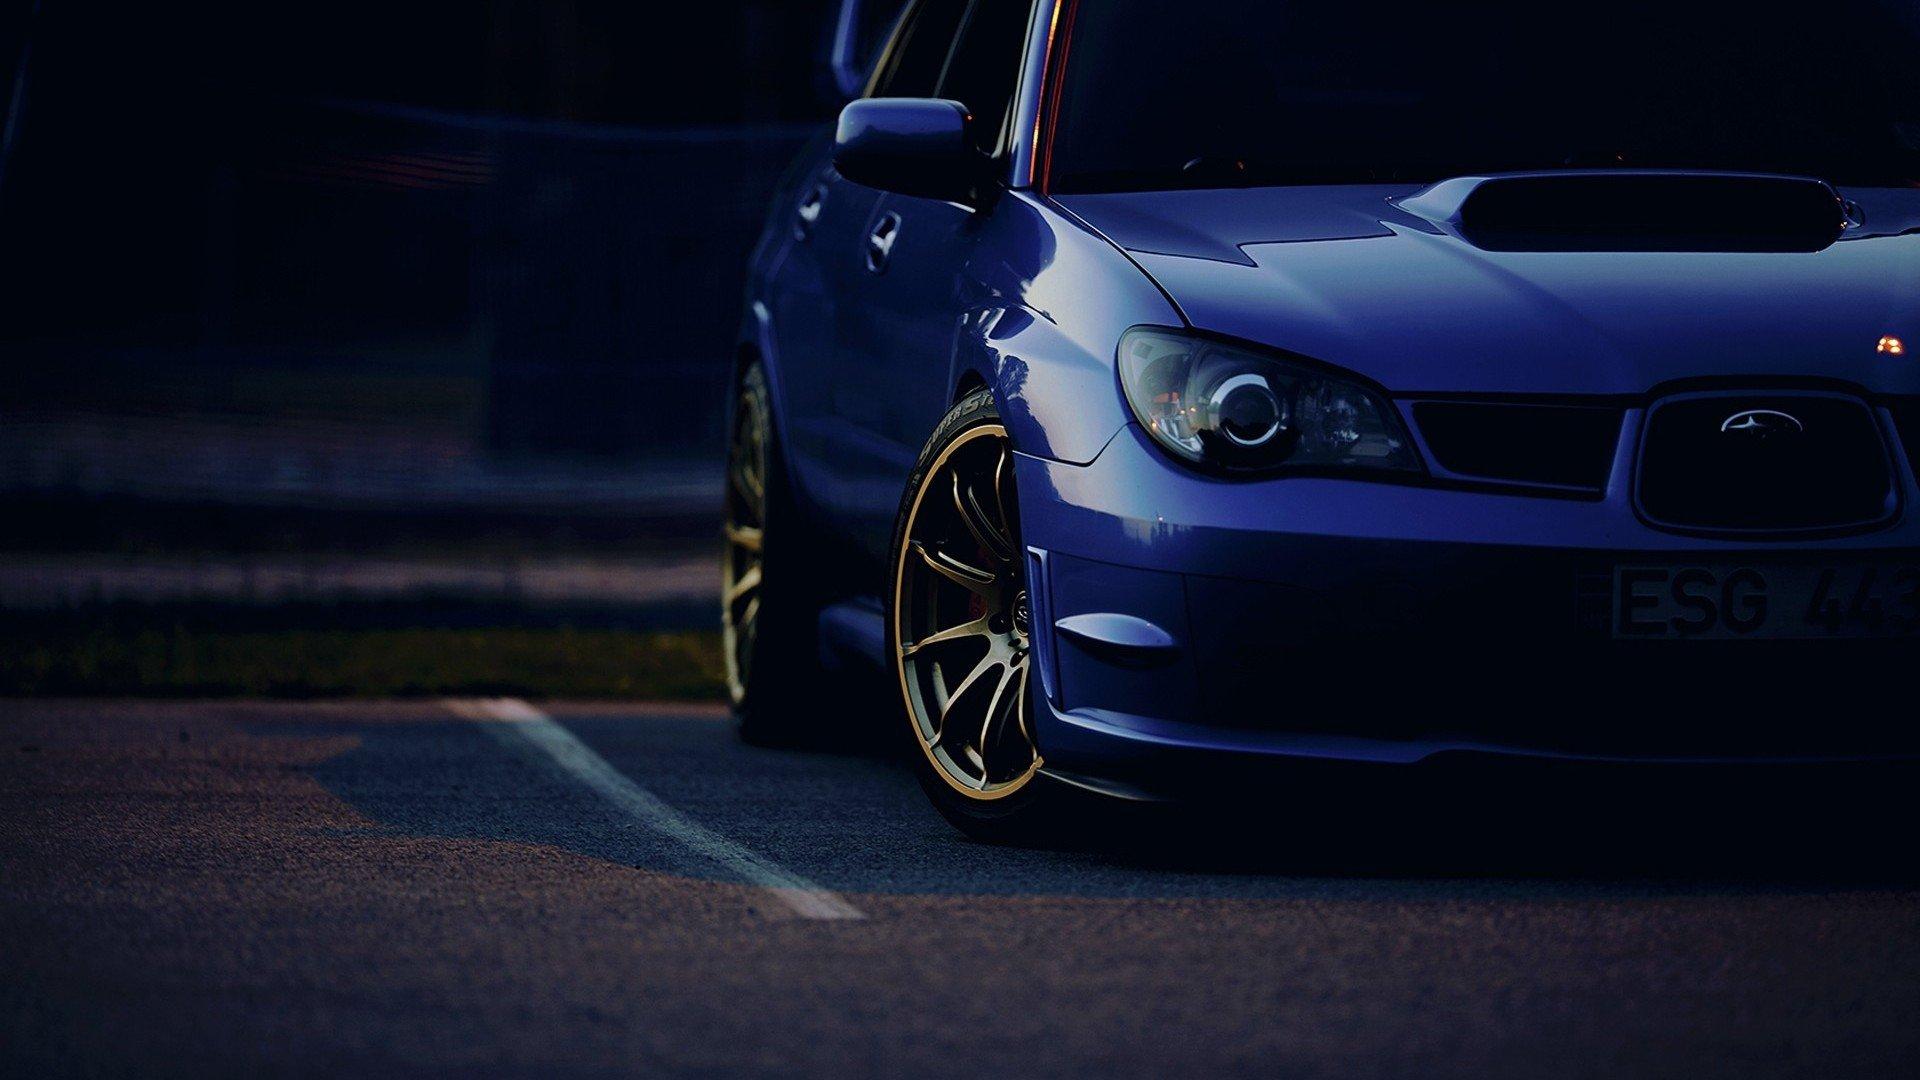 Subaru Impreza Wrx Sti Wallpaper 1920x1080 703177